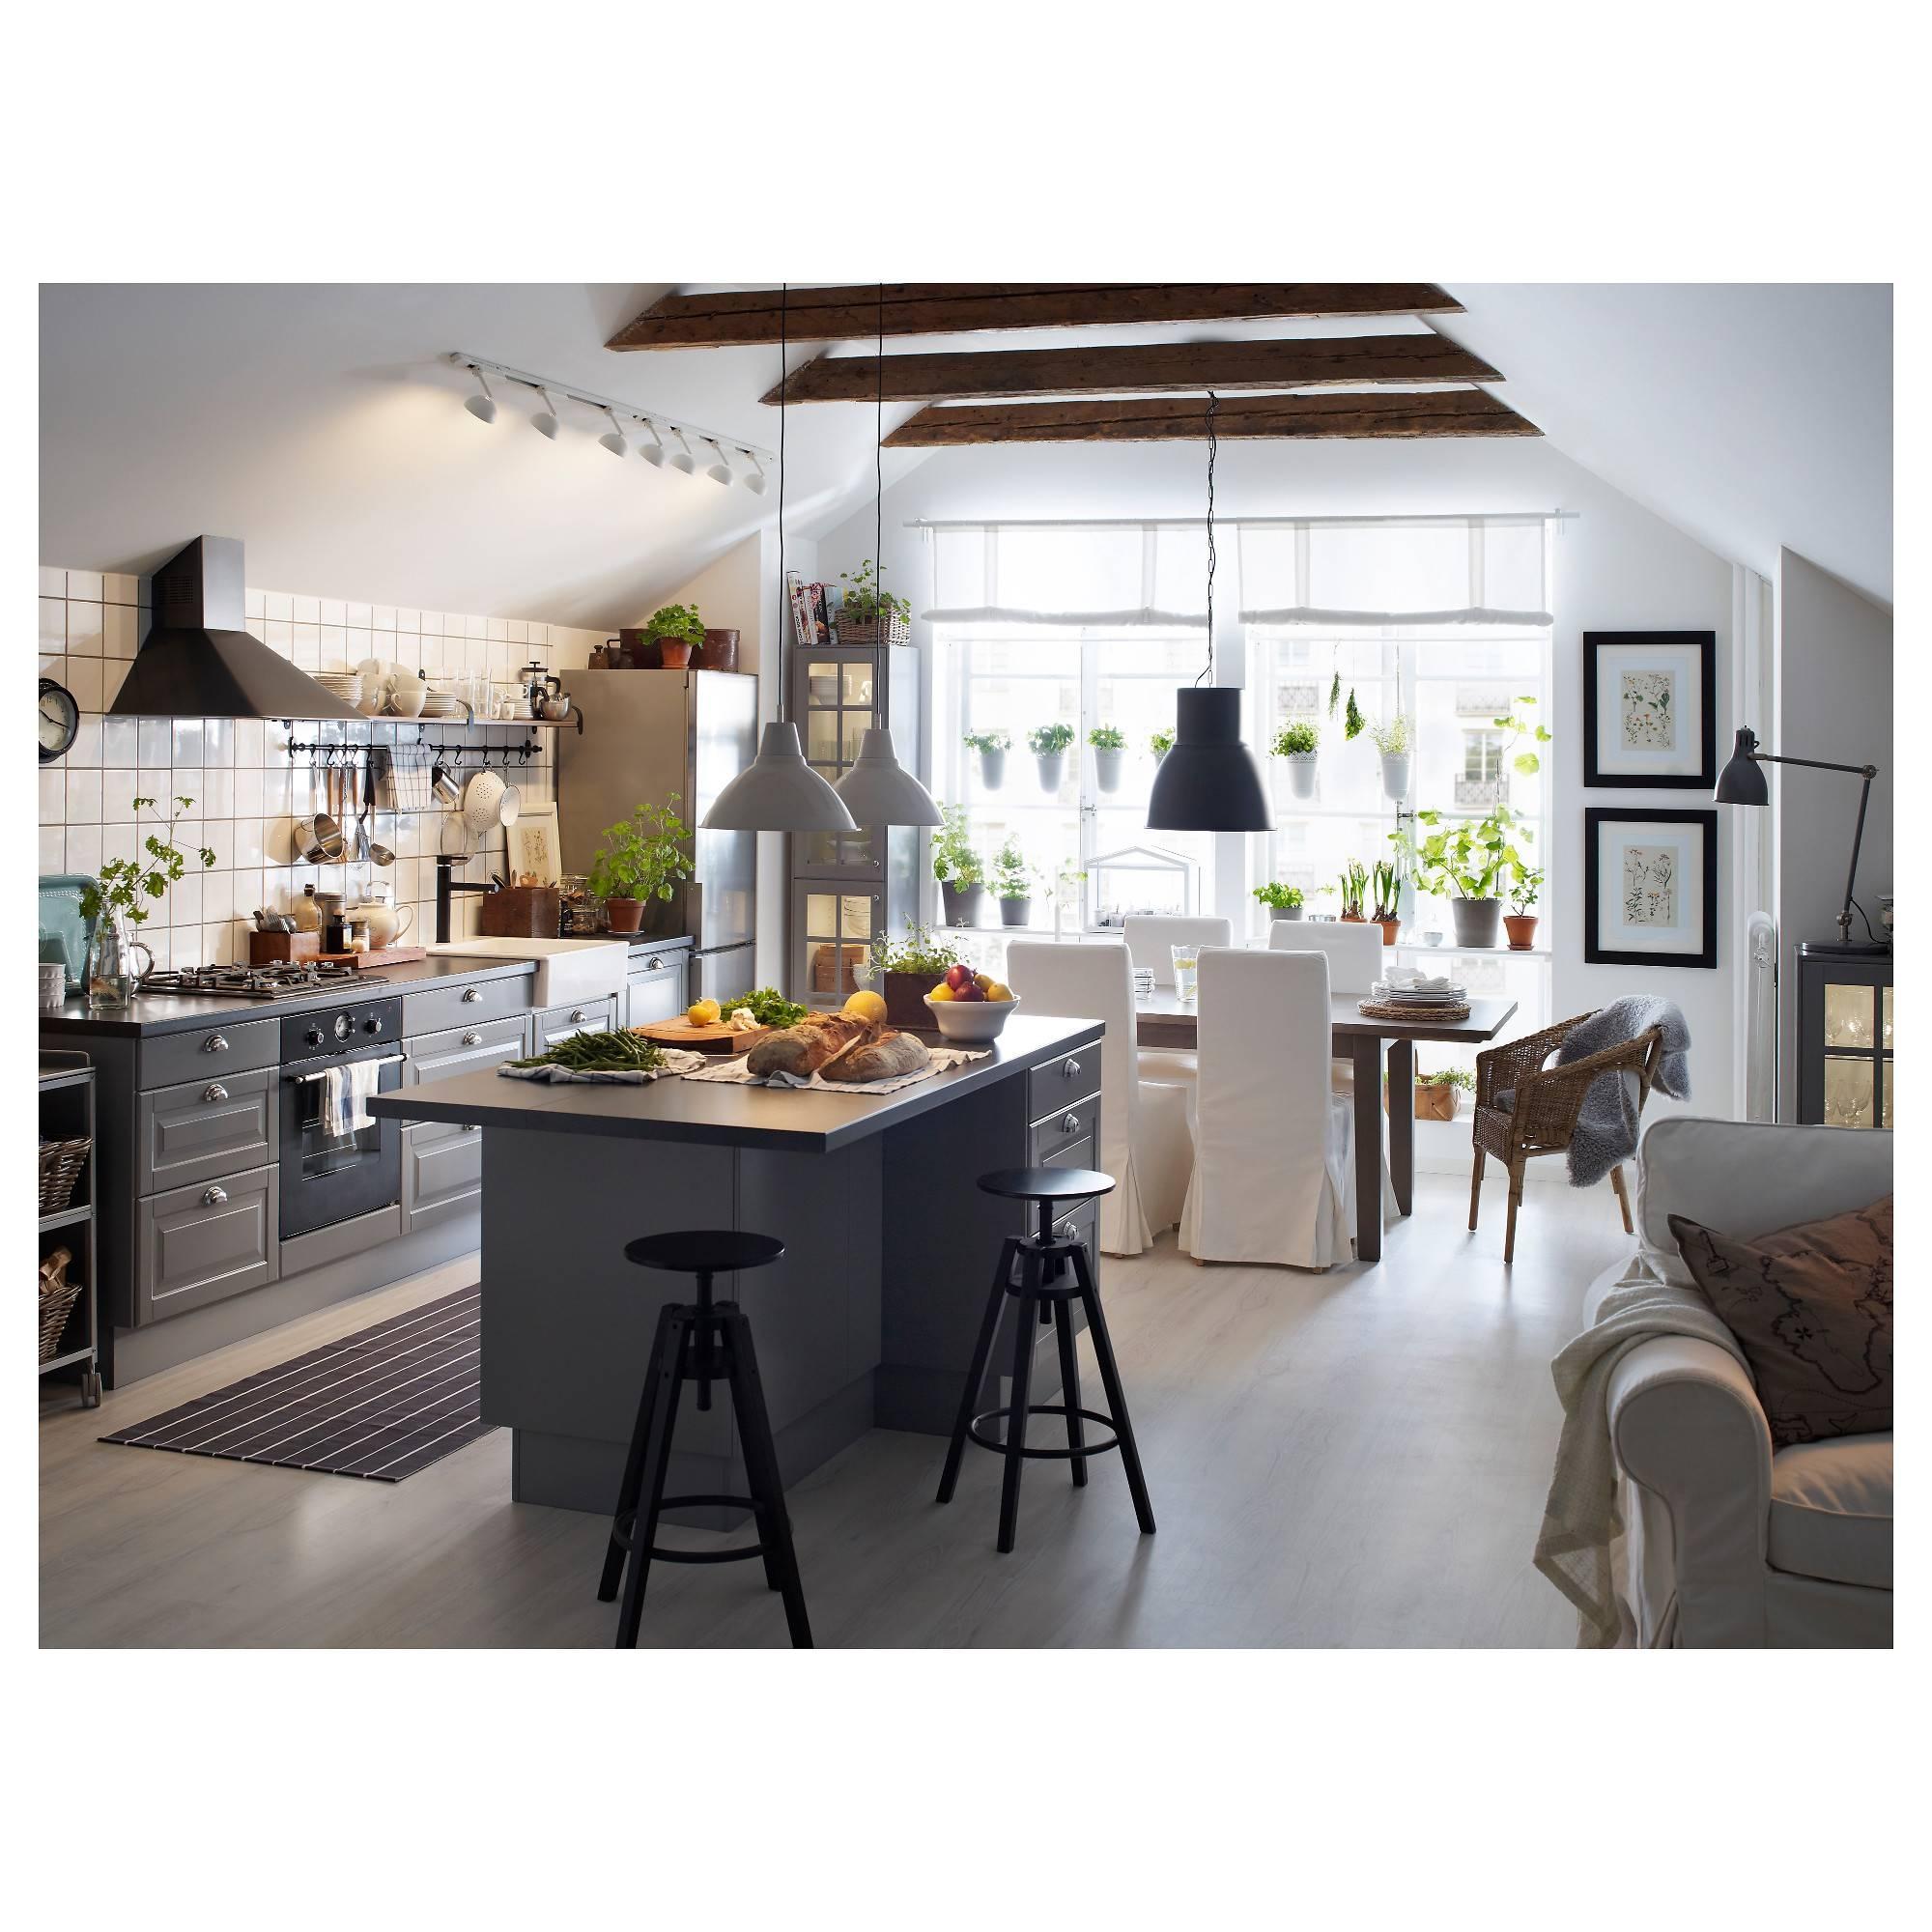 Hektar Pendant Lamp - Dark Gray, 22 Cm - Ikea with Ikea Kitchen Pendant Lights (Image 3 of 15)